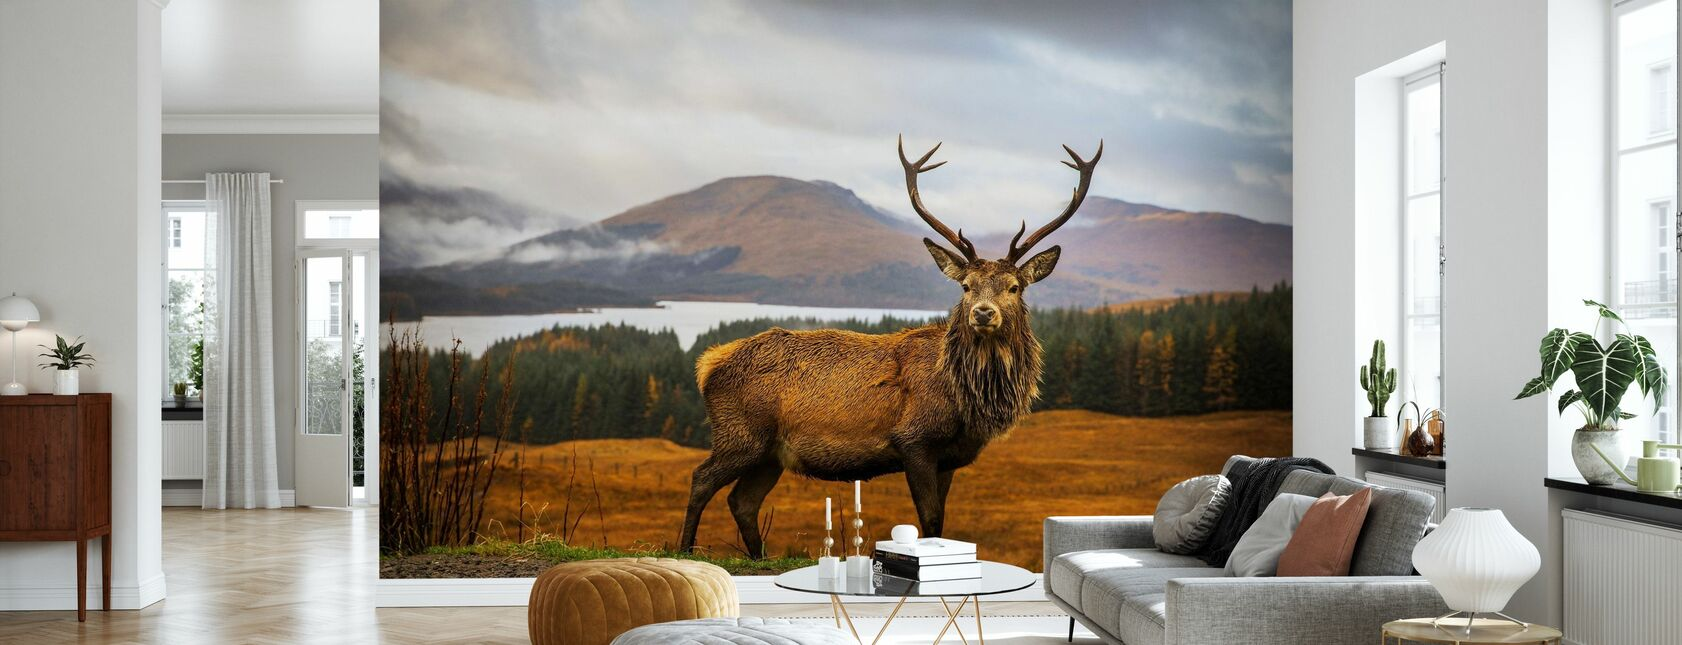 Scottish Stag - Wallpaper - Living Room